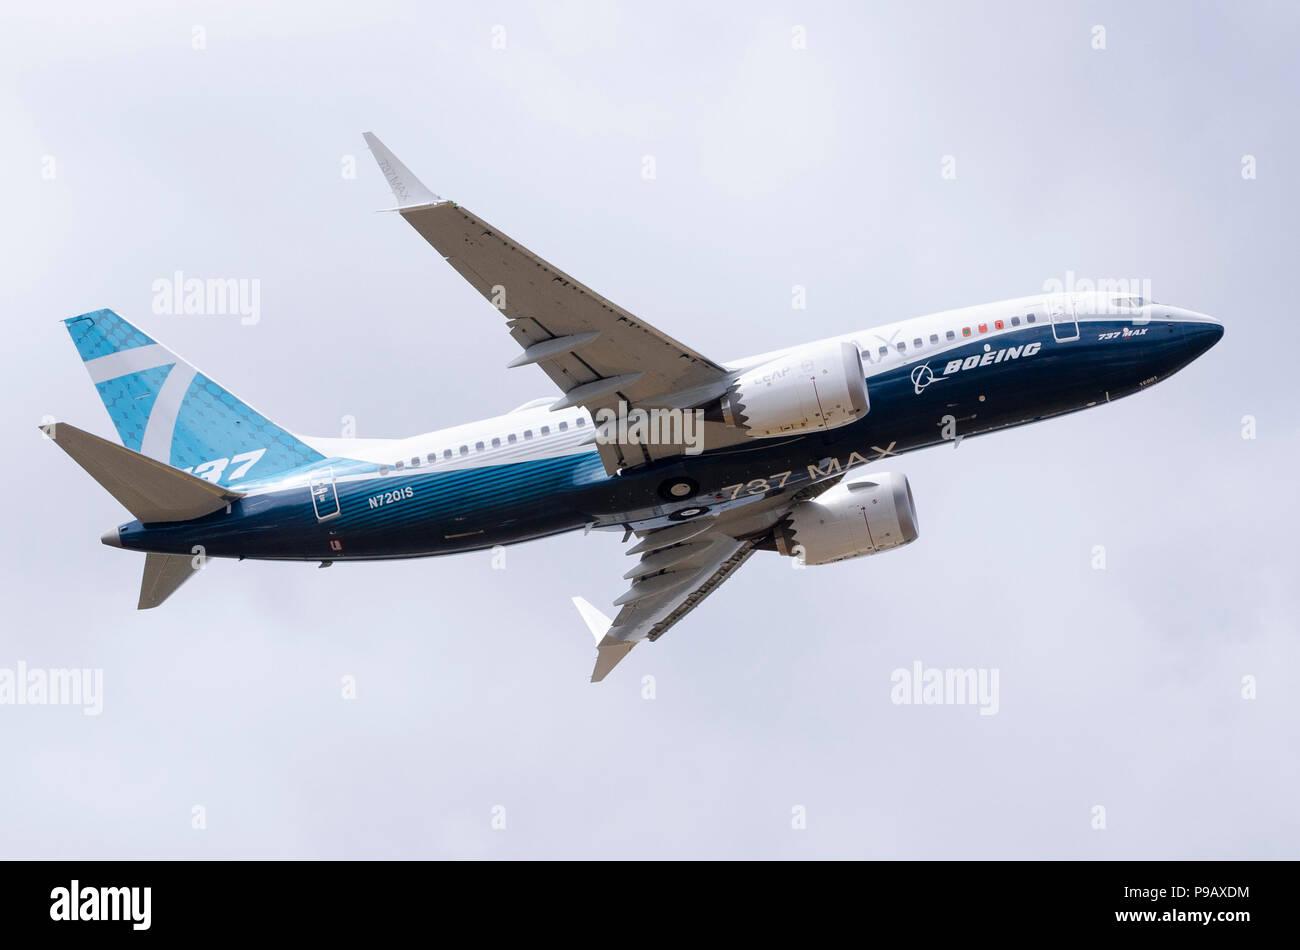 Boeing Max Plane Stock Photos & Boeing Max Plane Stock